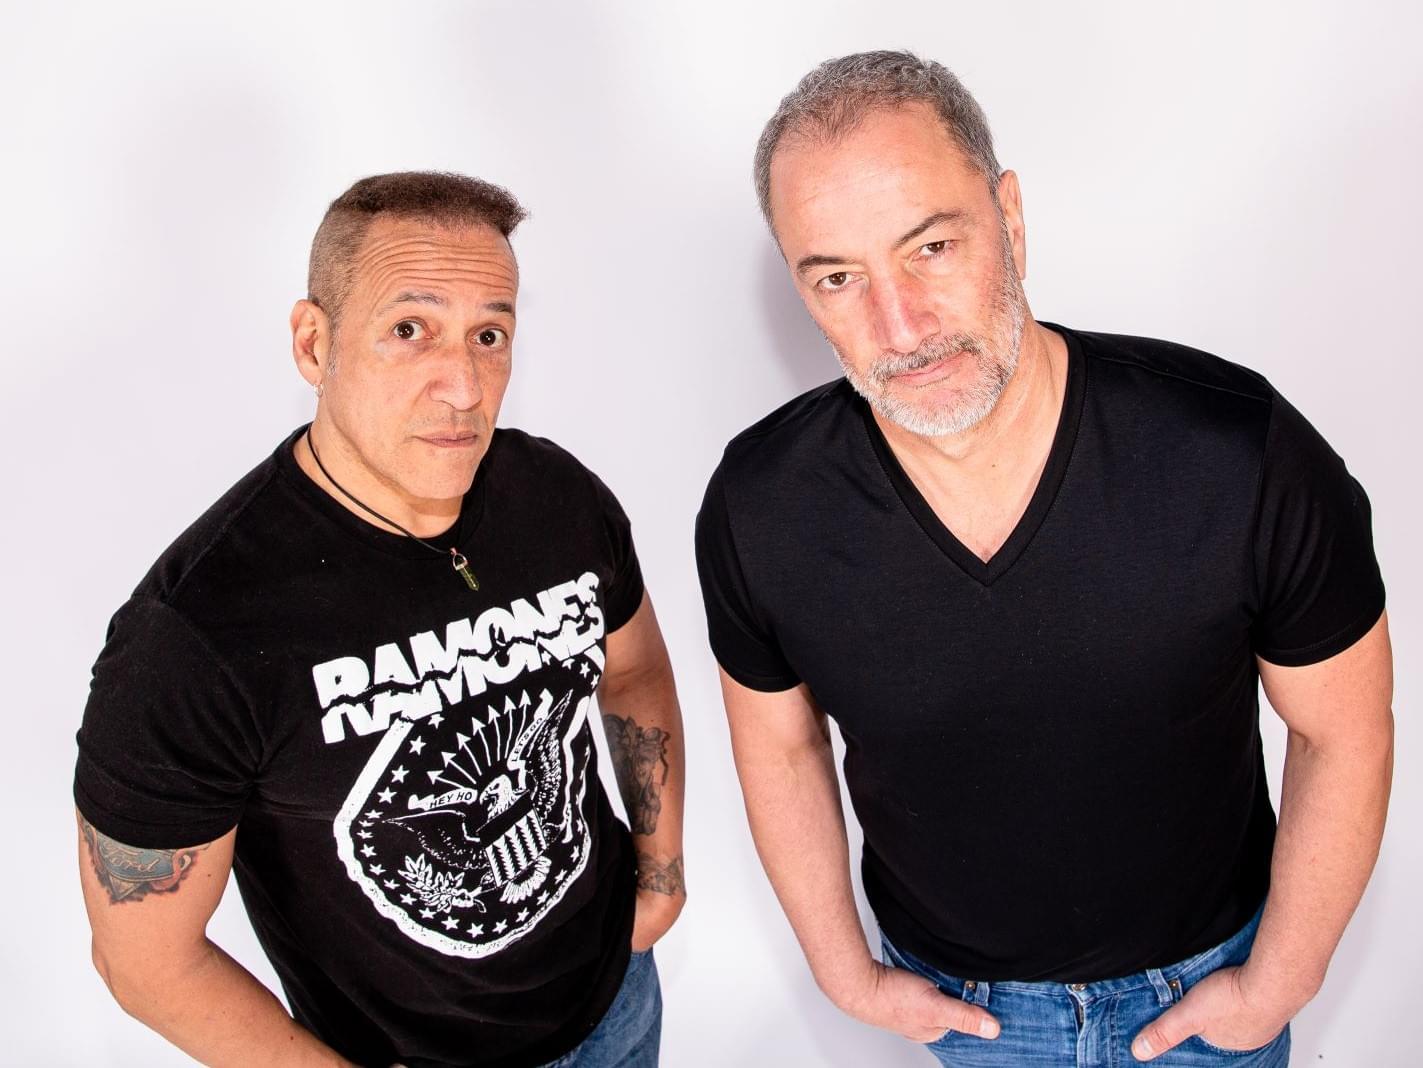 PODCAST – Thursday, September 5: New Haven PD Captain Duff Live In Studio